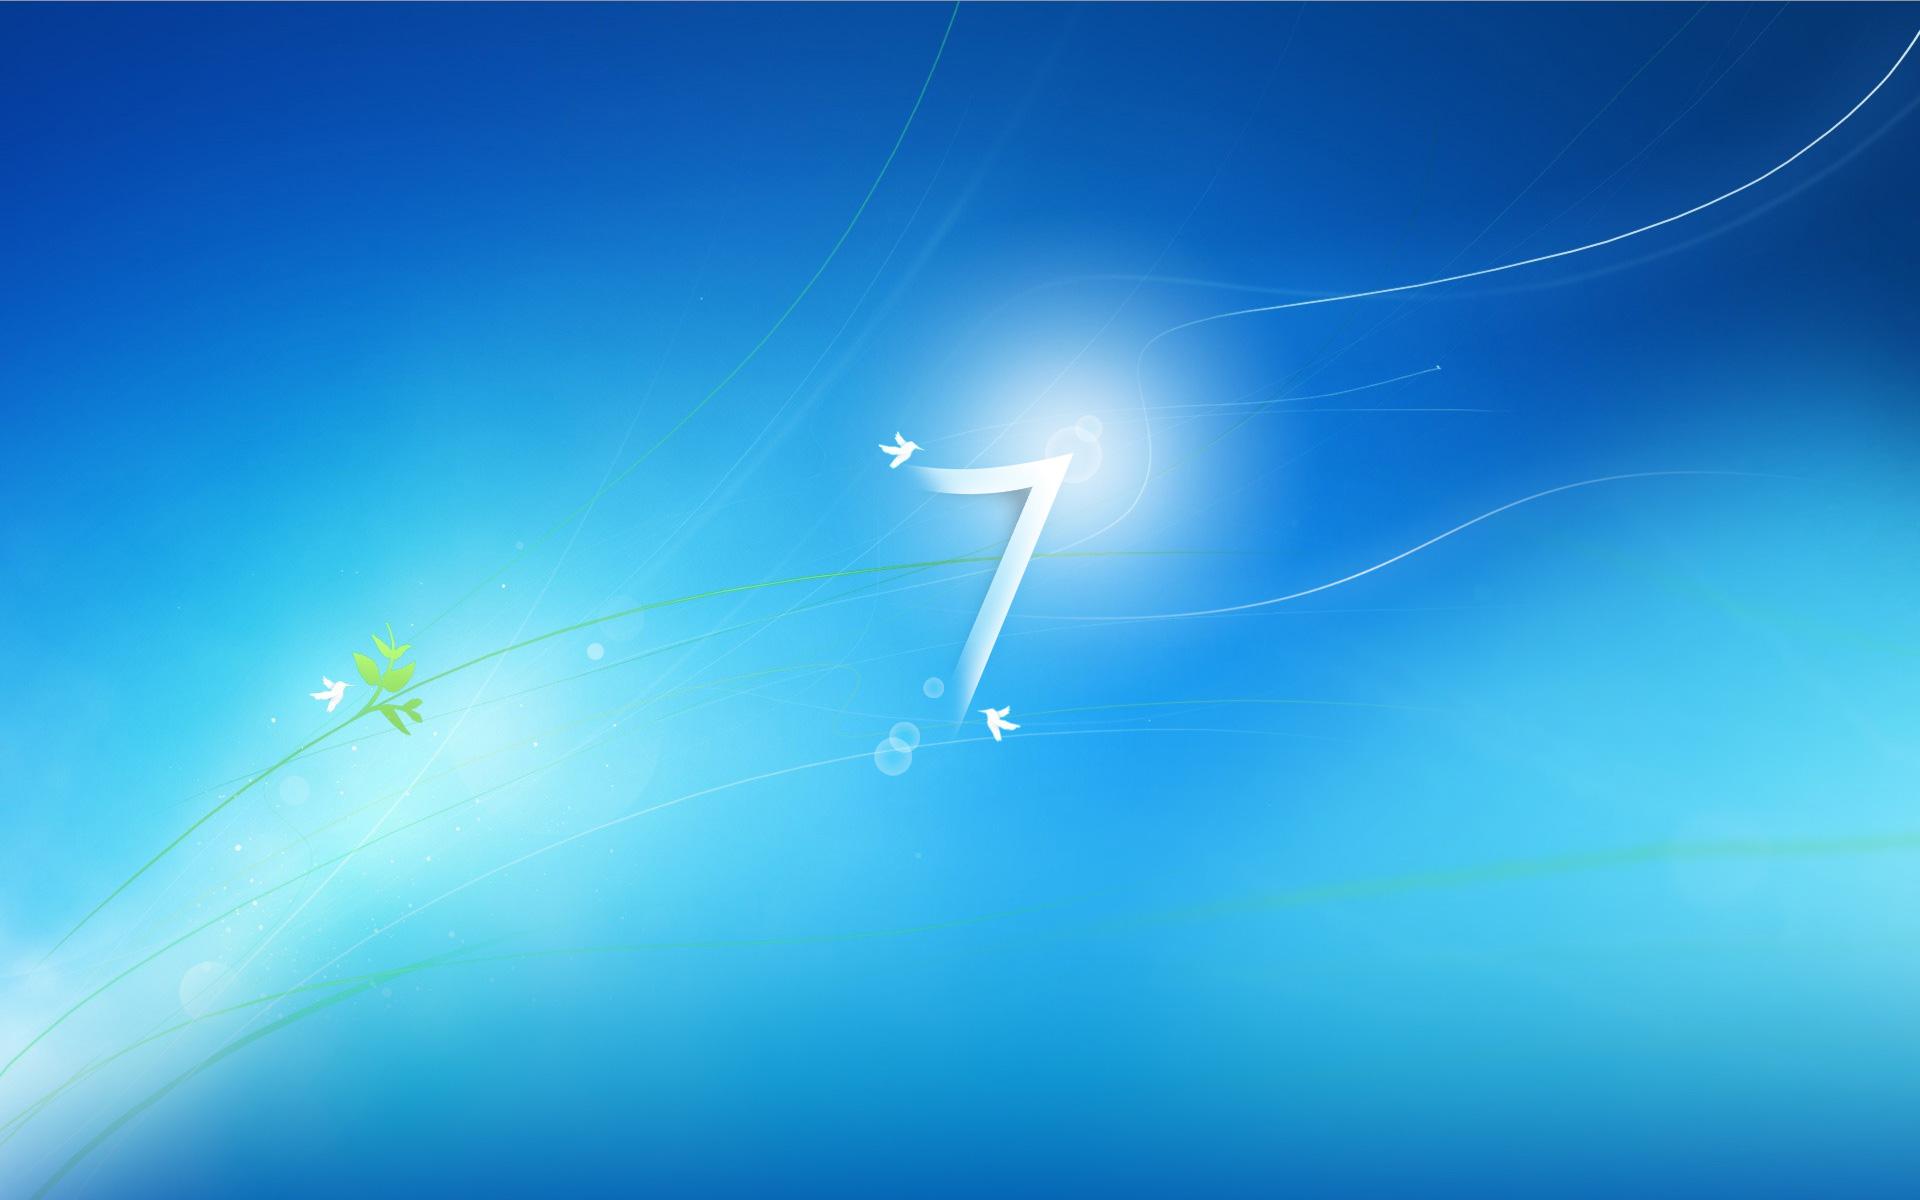 Windows 7 Widescreen Wallpapers HD 1920x1200